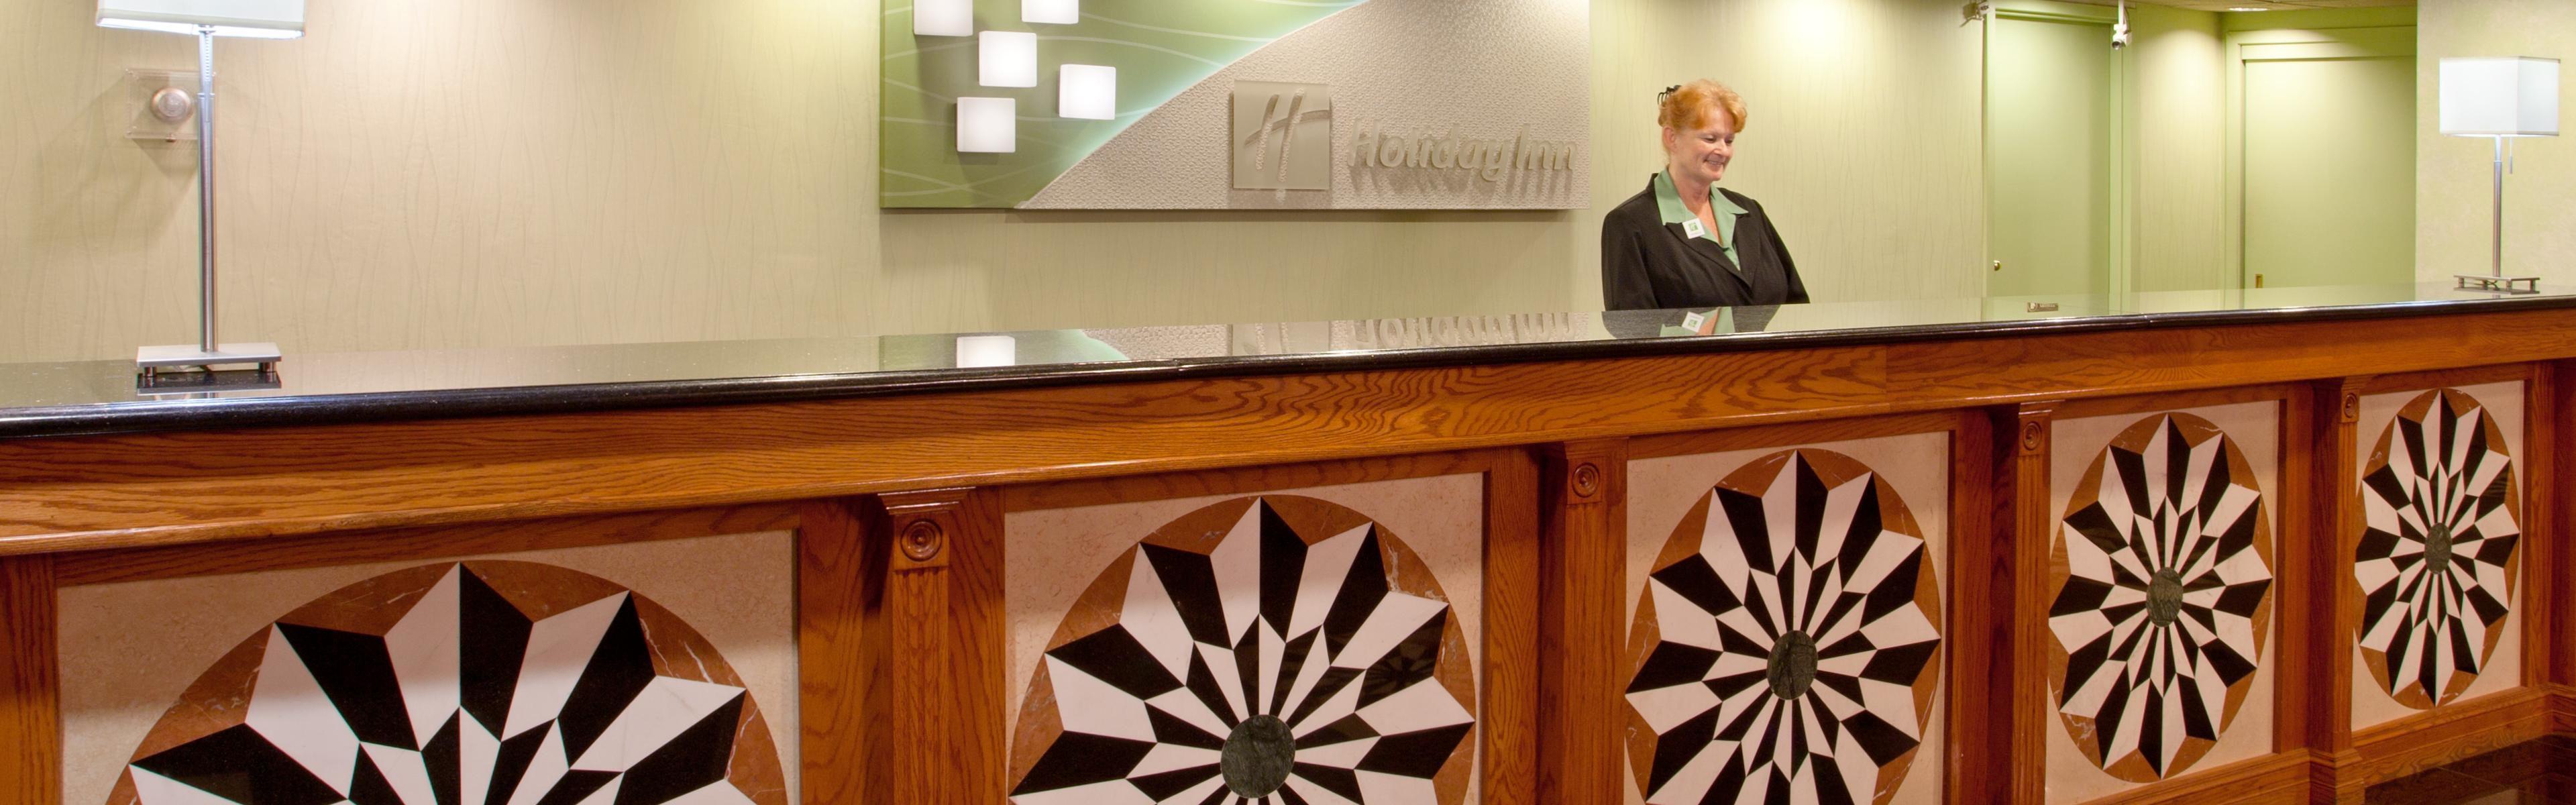 Holiday Inn Southgate (Detroit-South) image 0